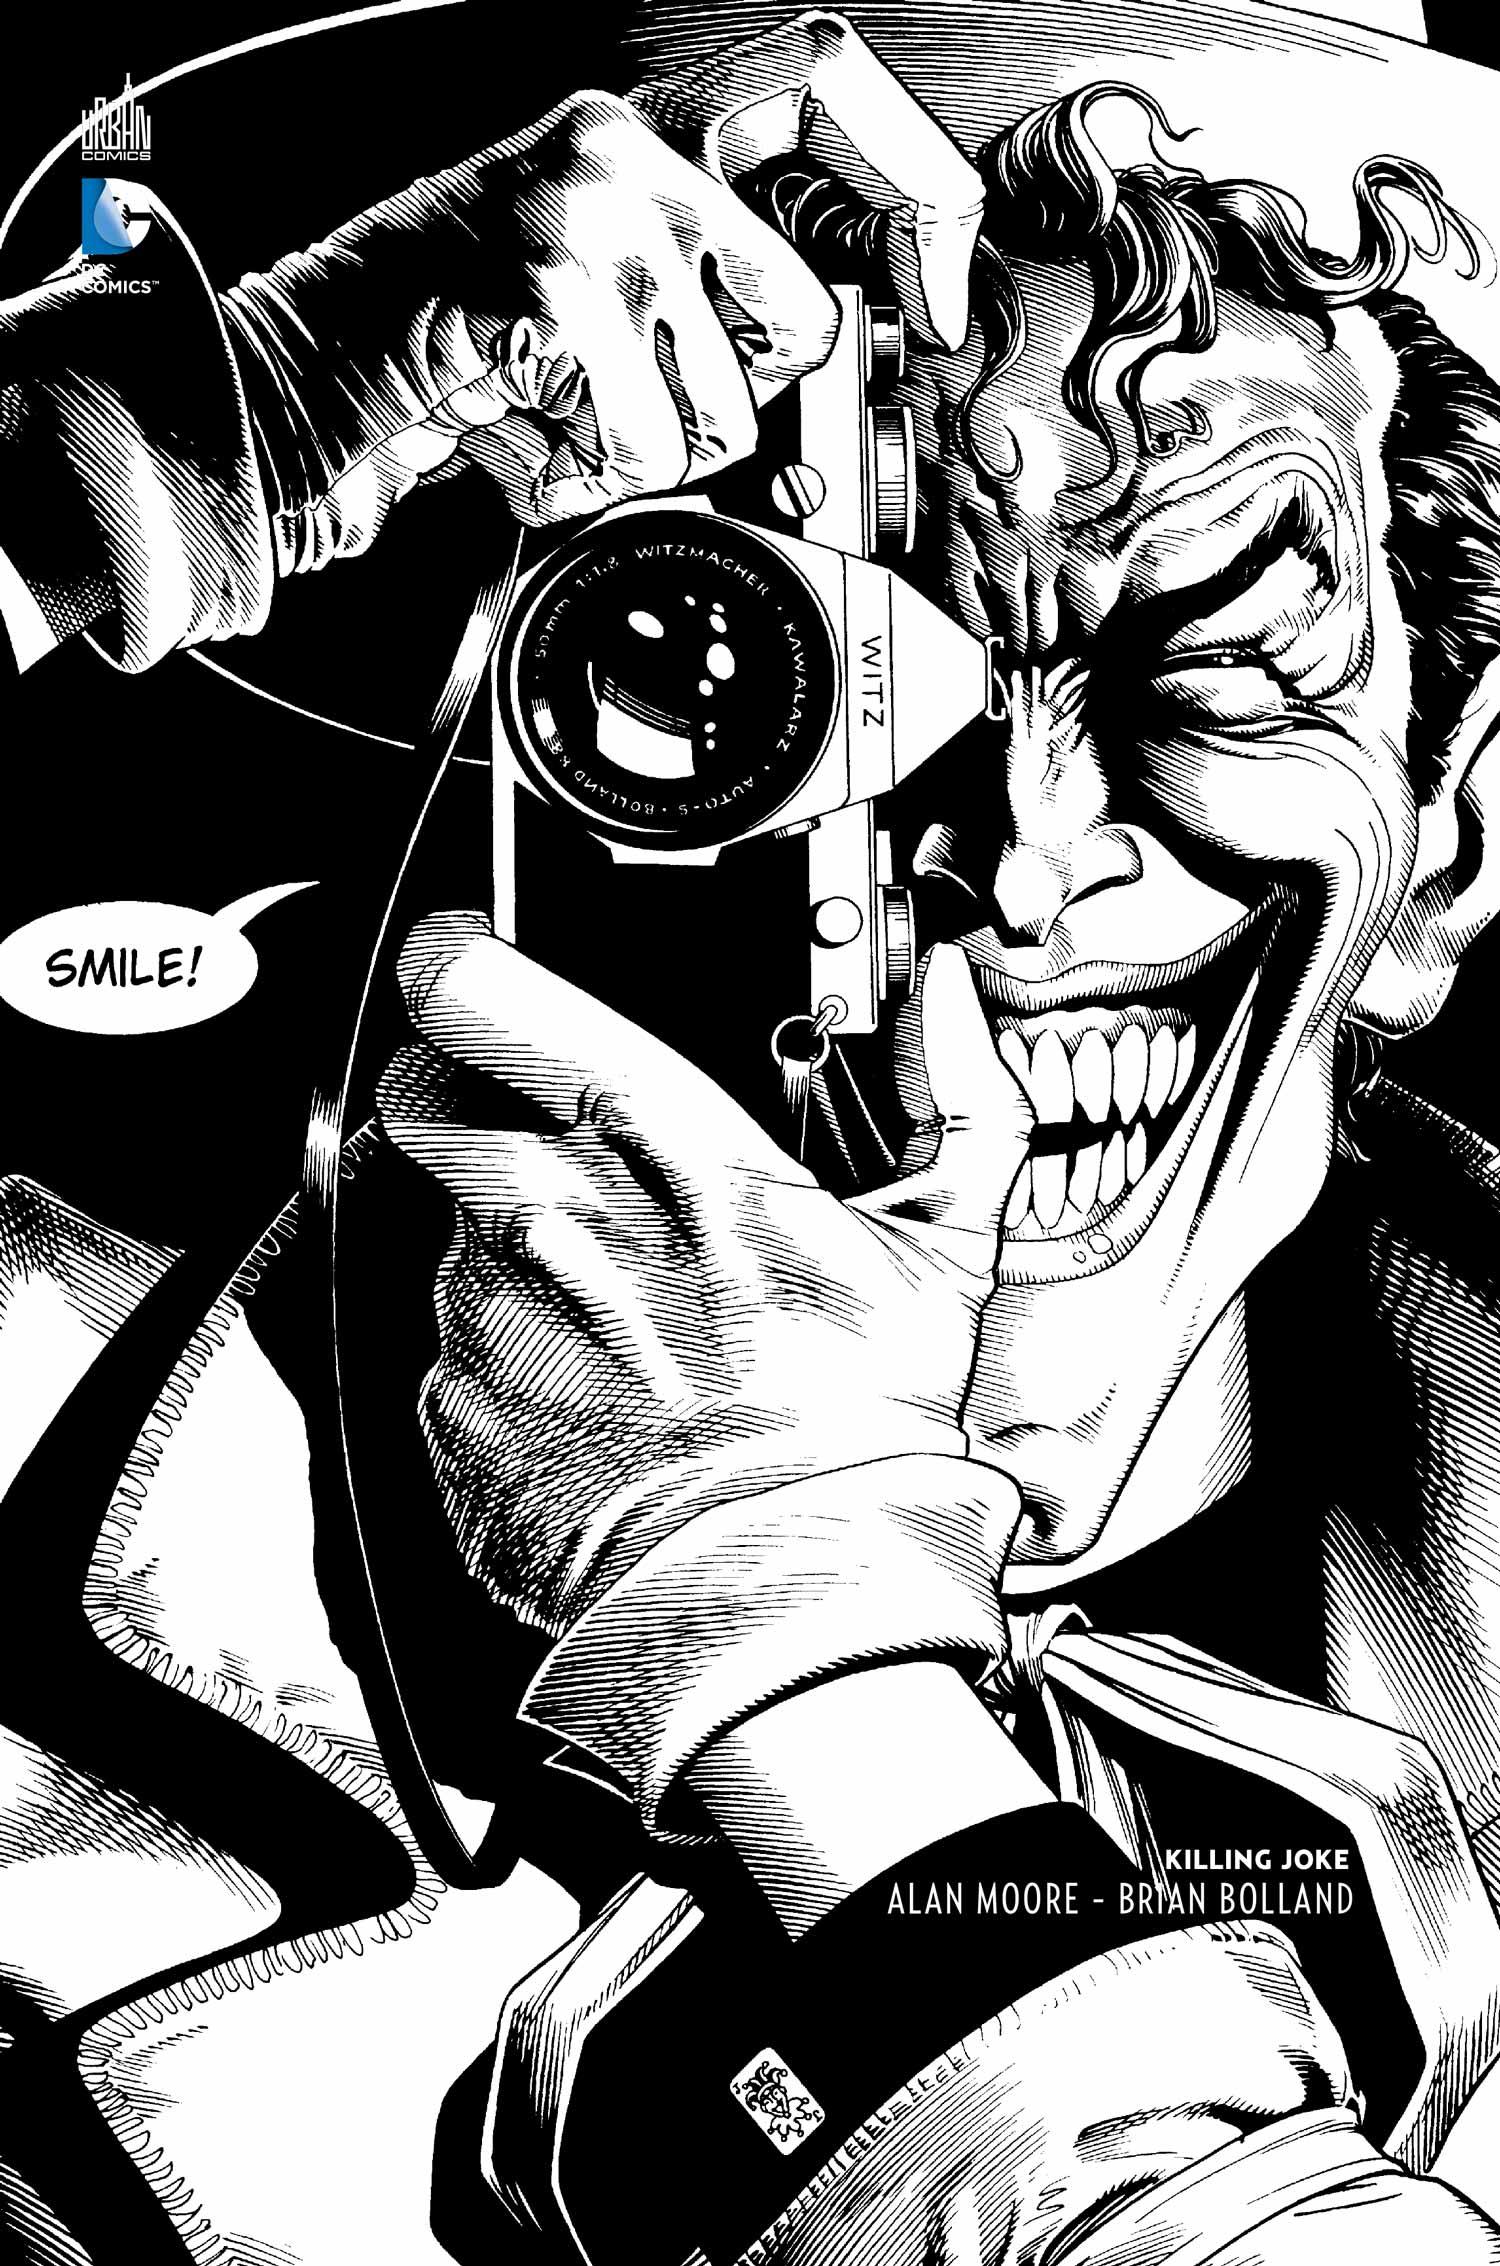 Batman - Rire et Mourir 1 - KILLING JOKE – 75 ANS